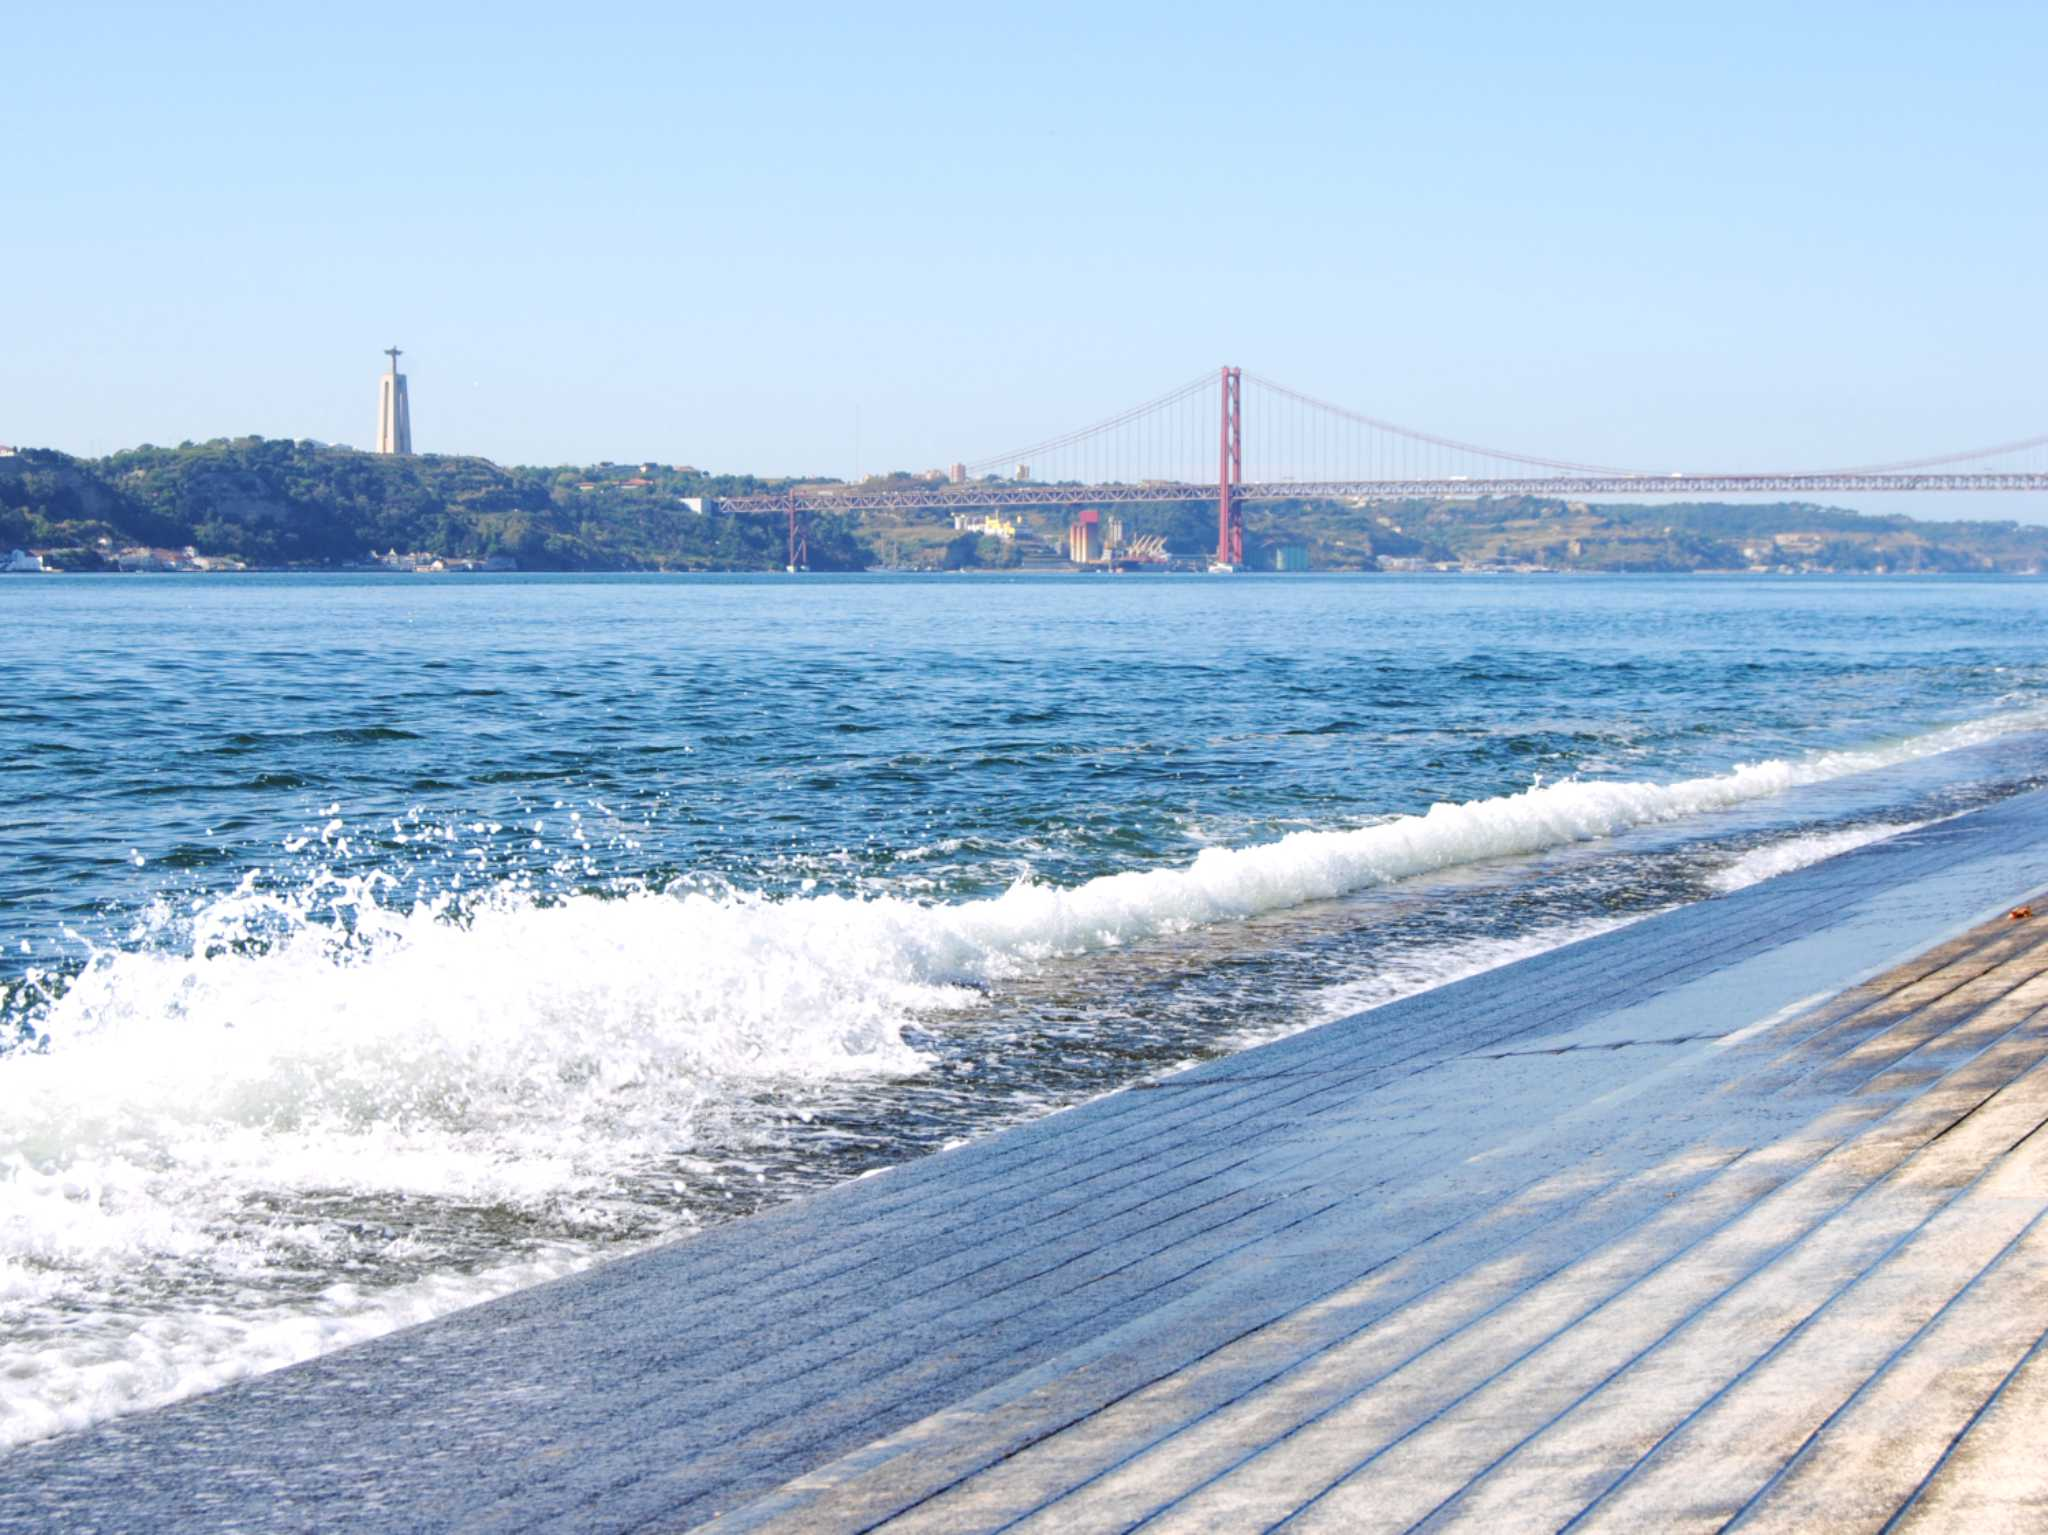 Spazieren am Fluss Tejo in Lissabon. Foto: Nina Härtle